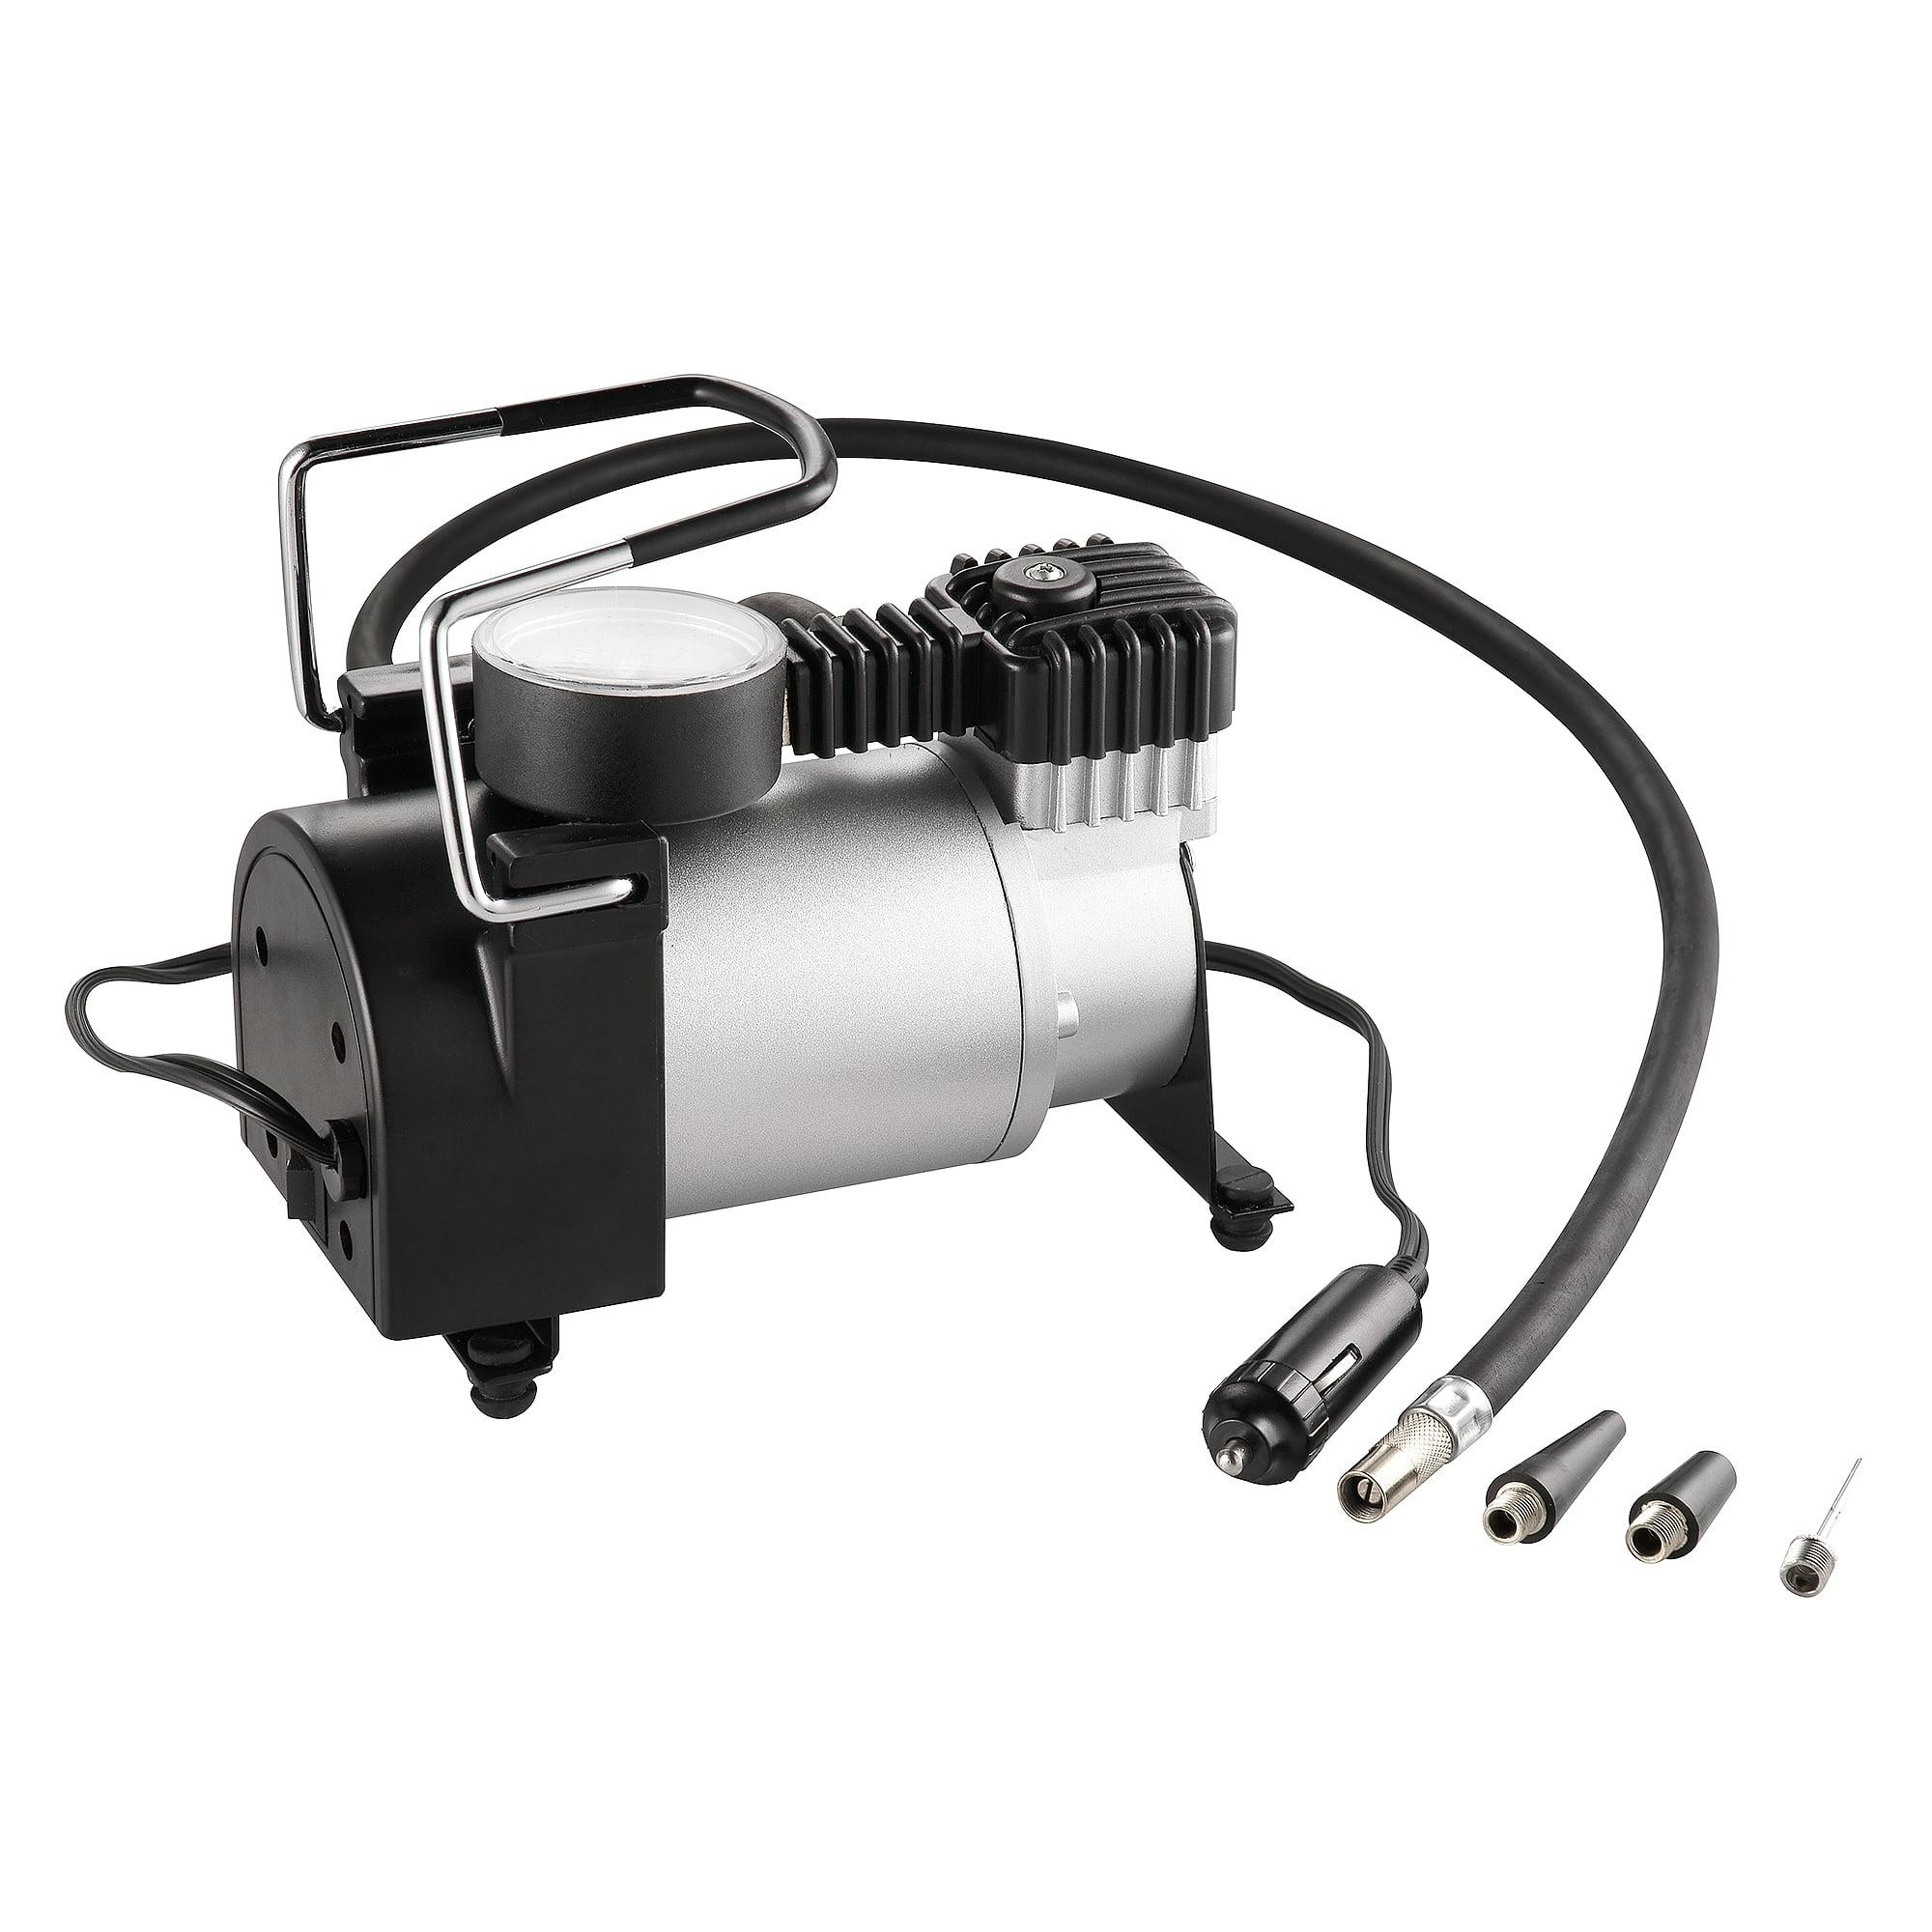 RAD Sportz 12 Volt Electric Air Captain Air Compressor w/ Gauge for Bike or Auto